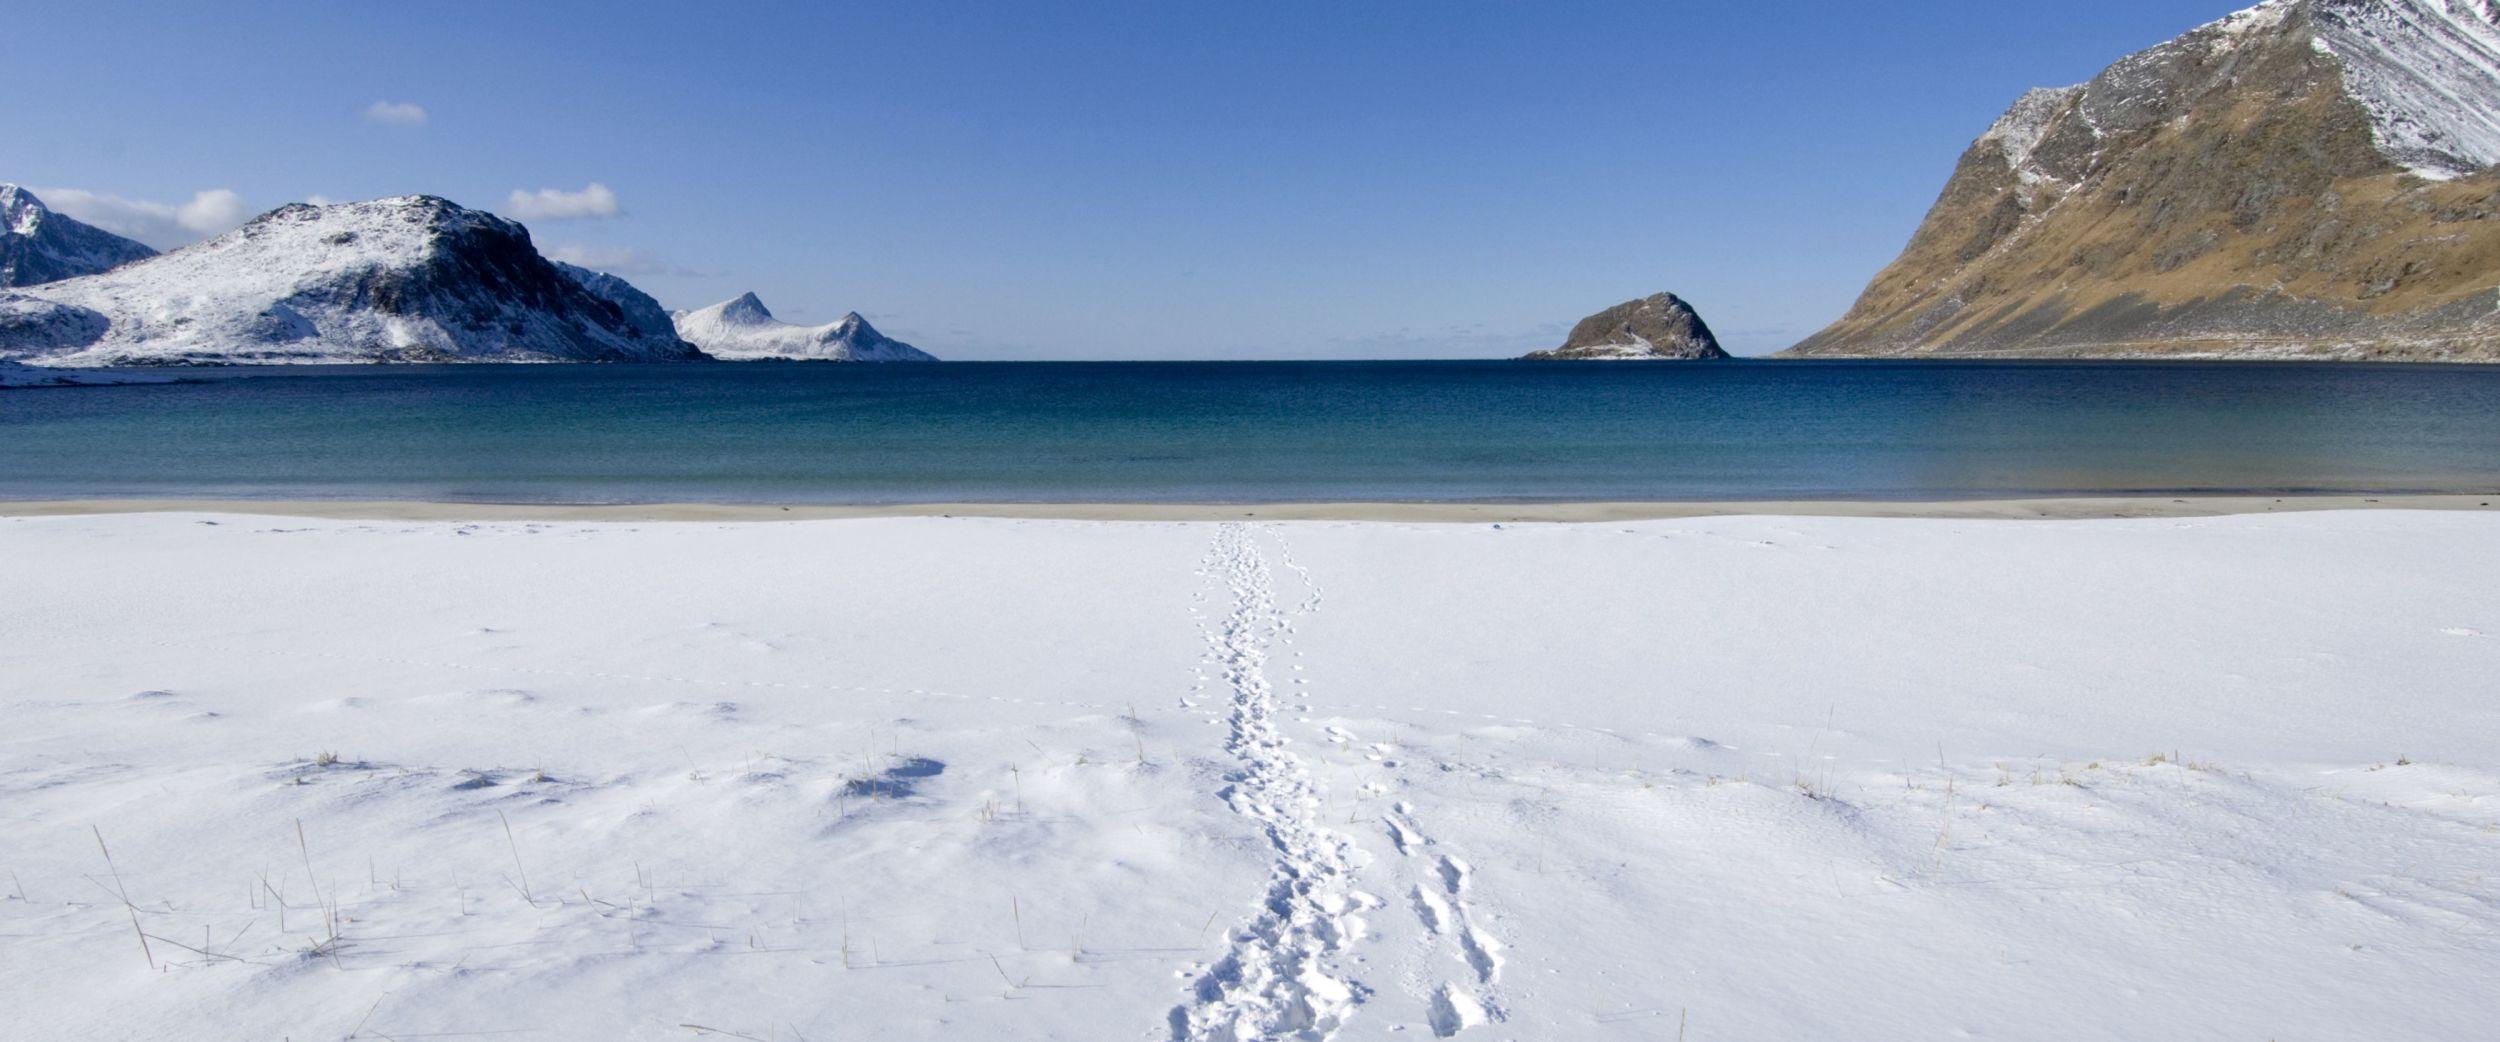 Beach covered with snow in Lofoten, photo, Terje Rakke, Nordic Life, nordnorge.com